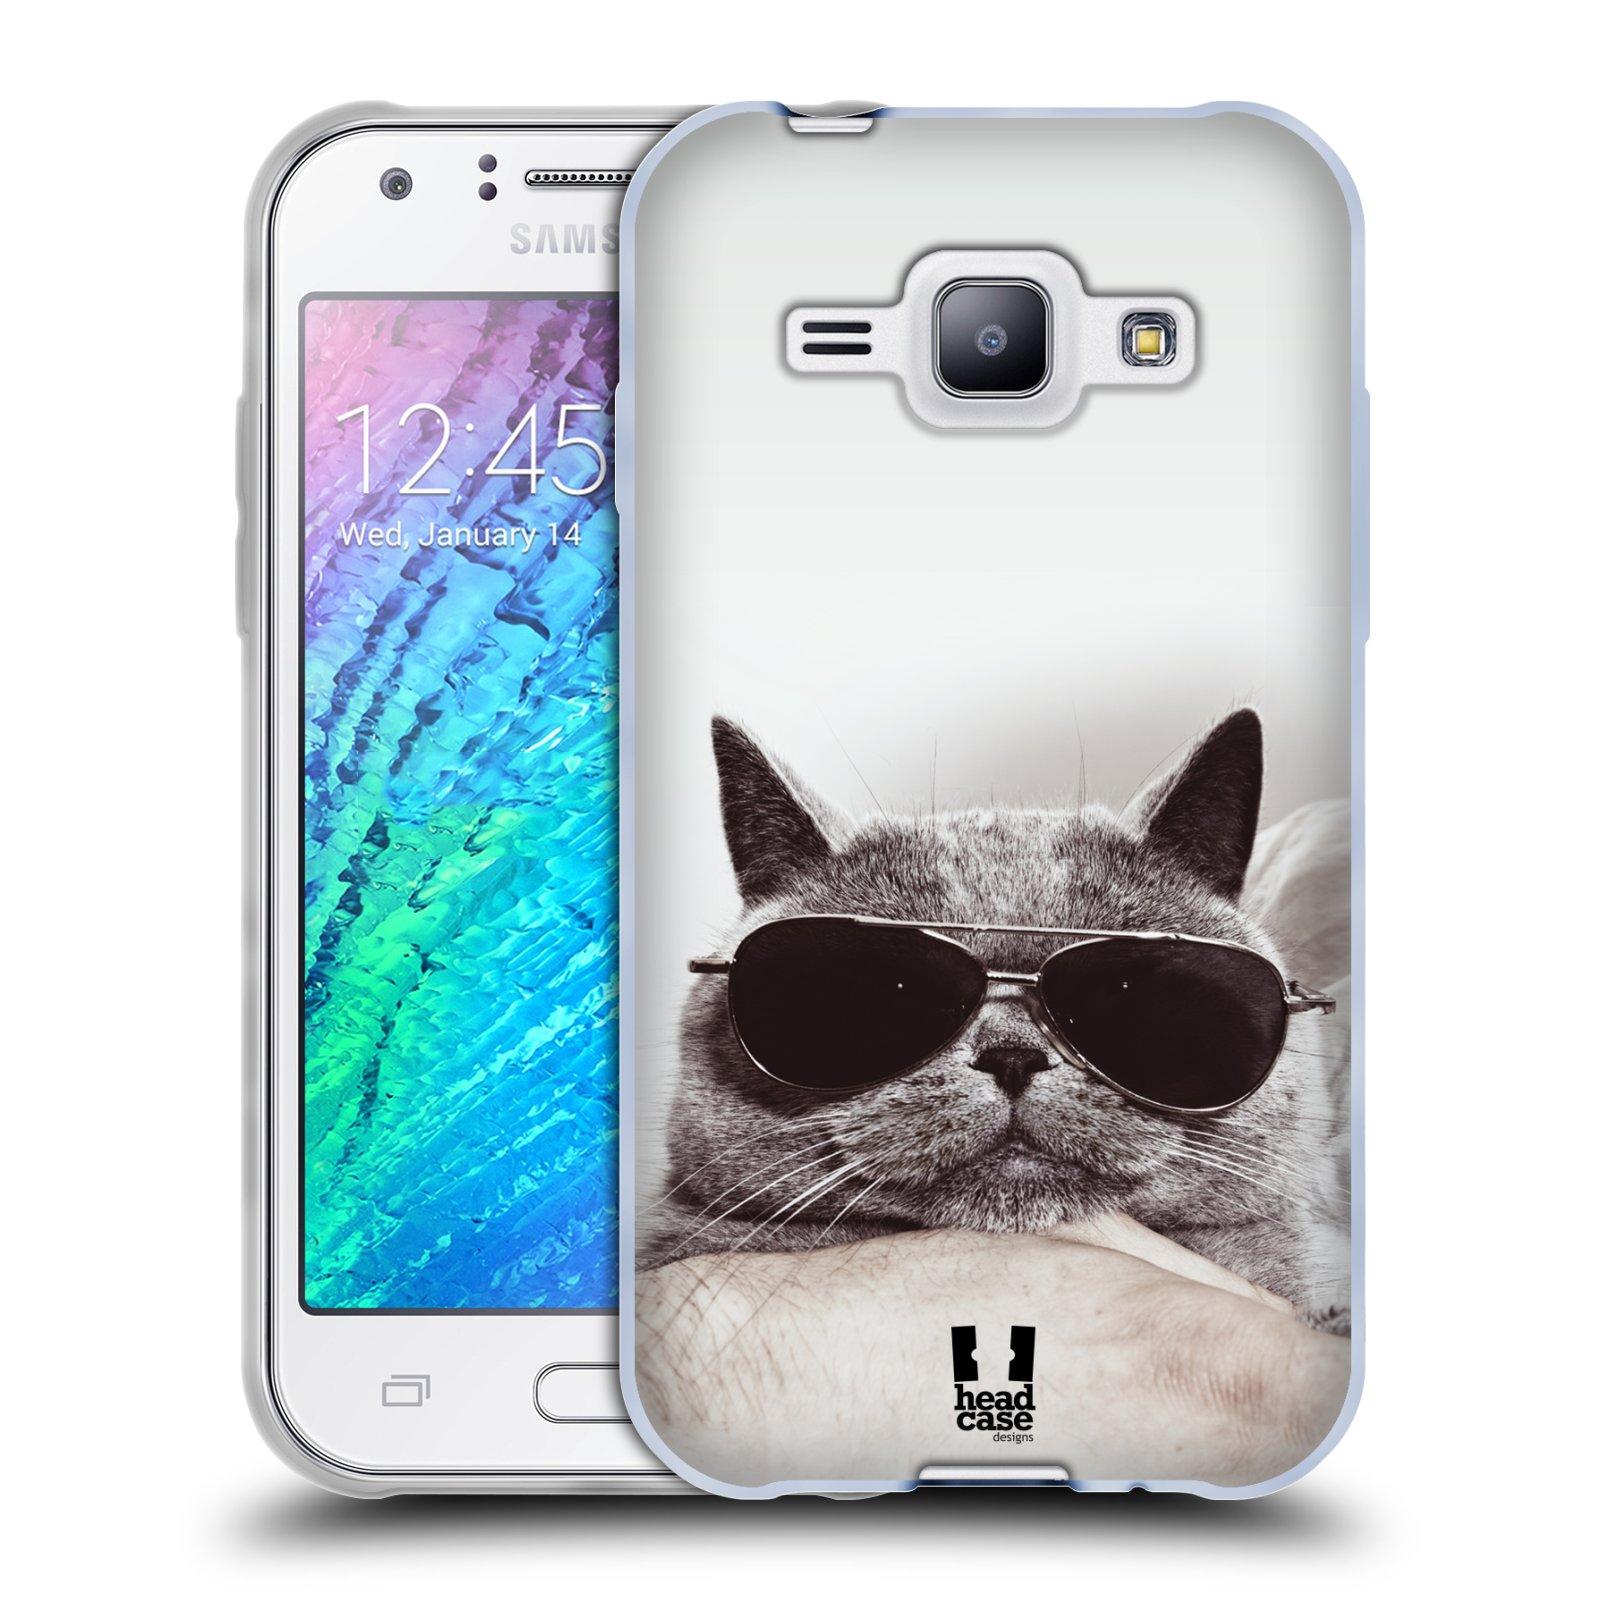 Silikonové pouzdro na mobil Samsung Galaxy J1 HEAD CASE KOTĚ S BRÝLEMI (Silikonový kryt či obal na mobilní telefon Samsung Galaxy J1 a J1 Duos)